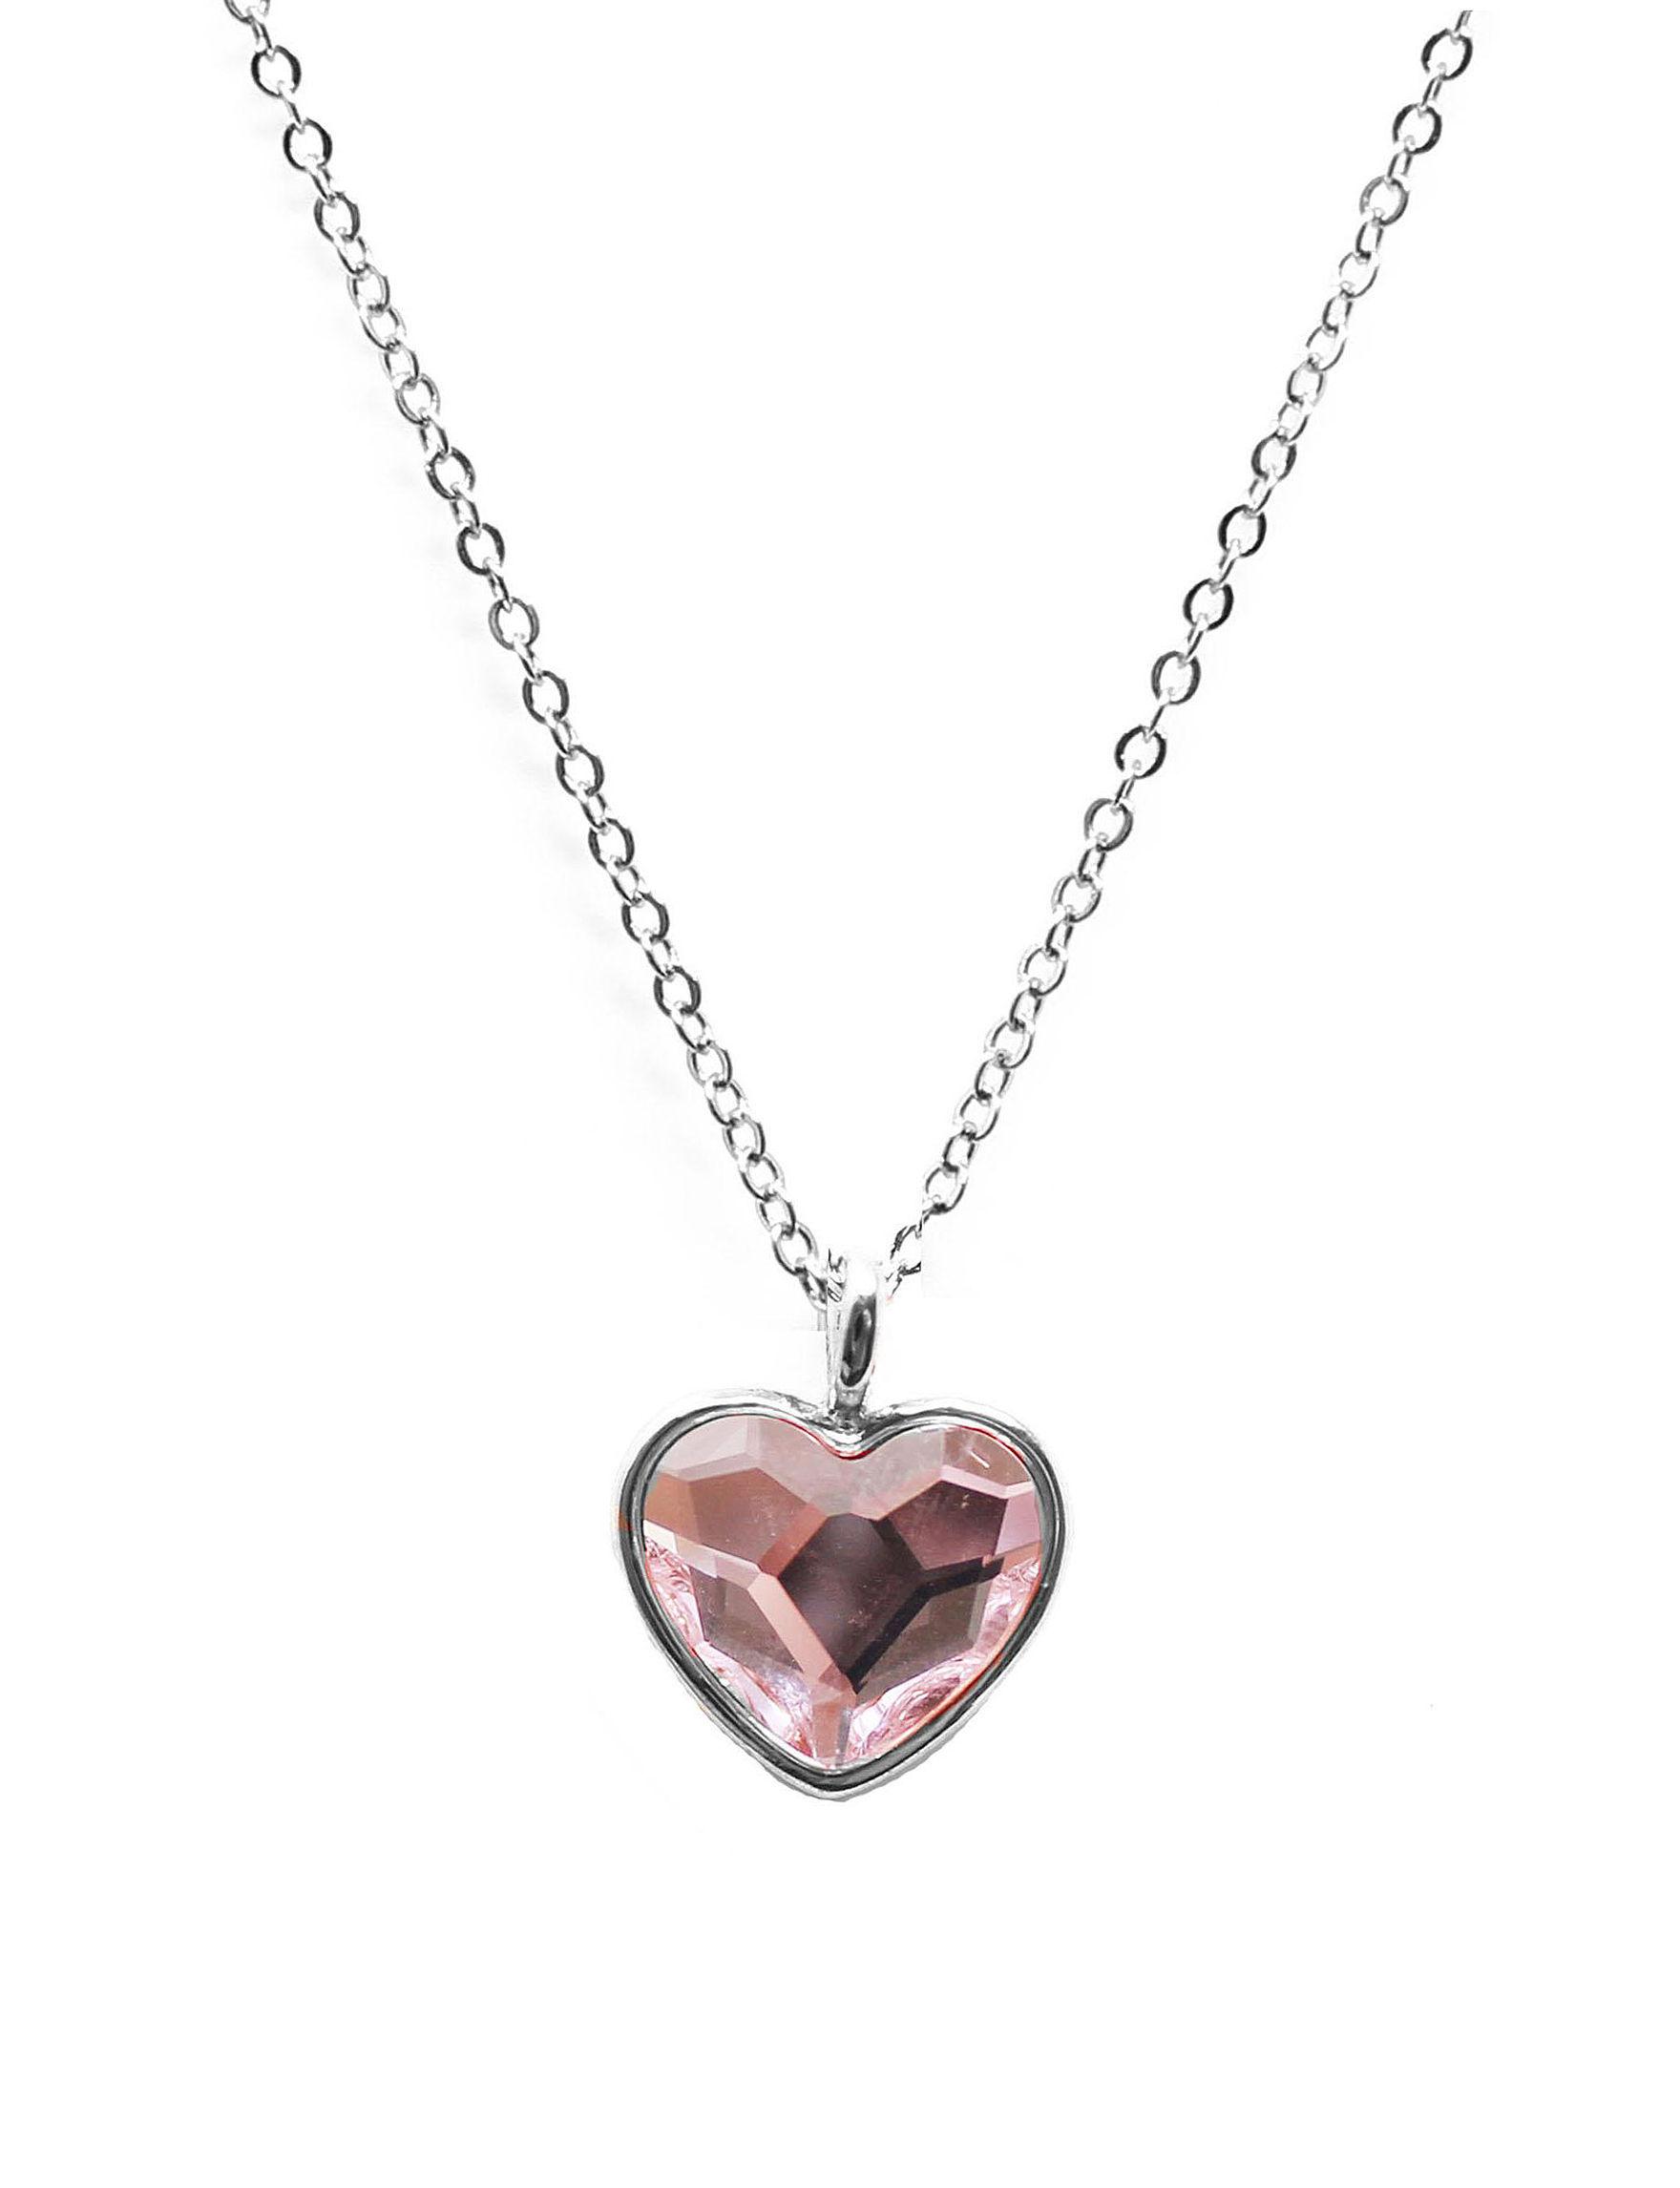 L & J Silver Necklaces & Pendants Fine Jewelry